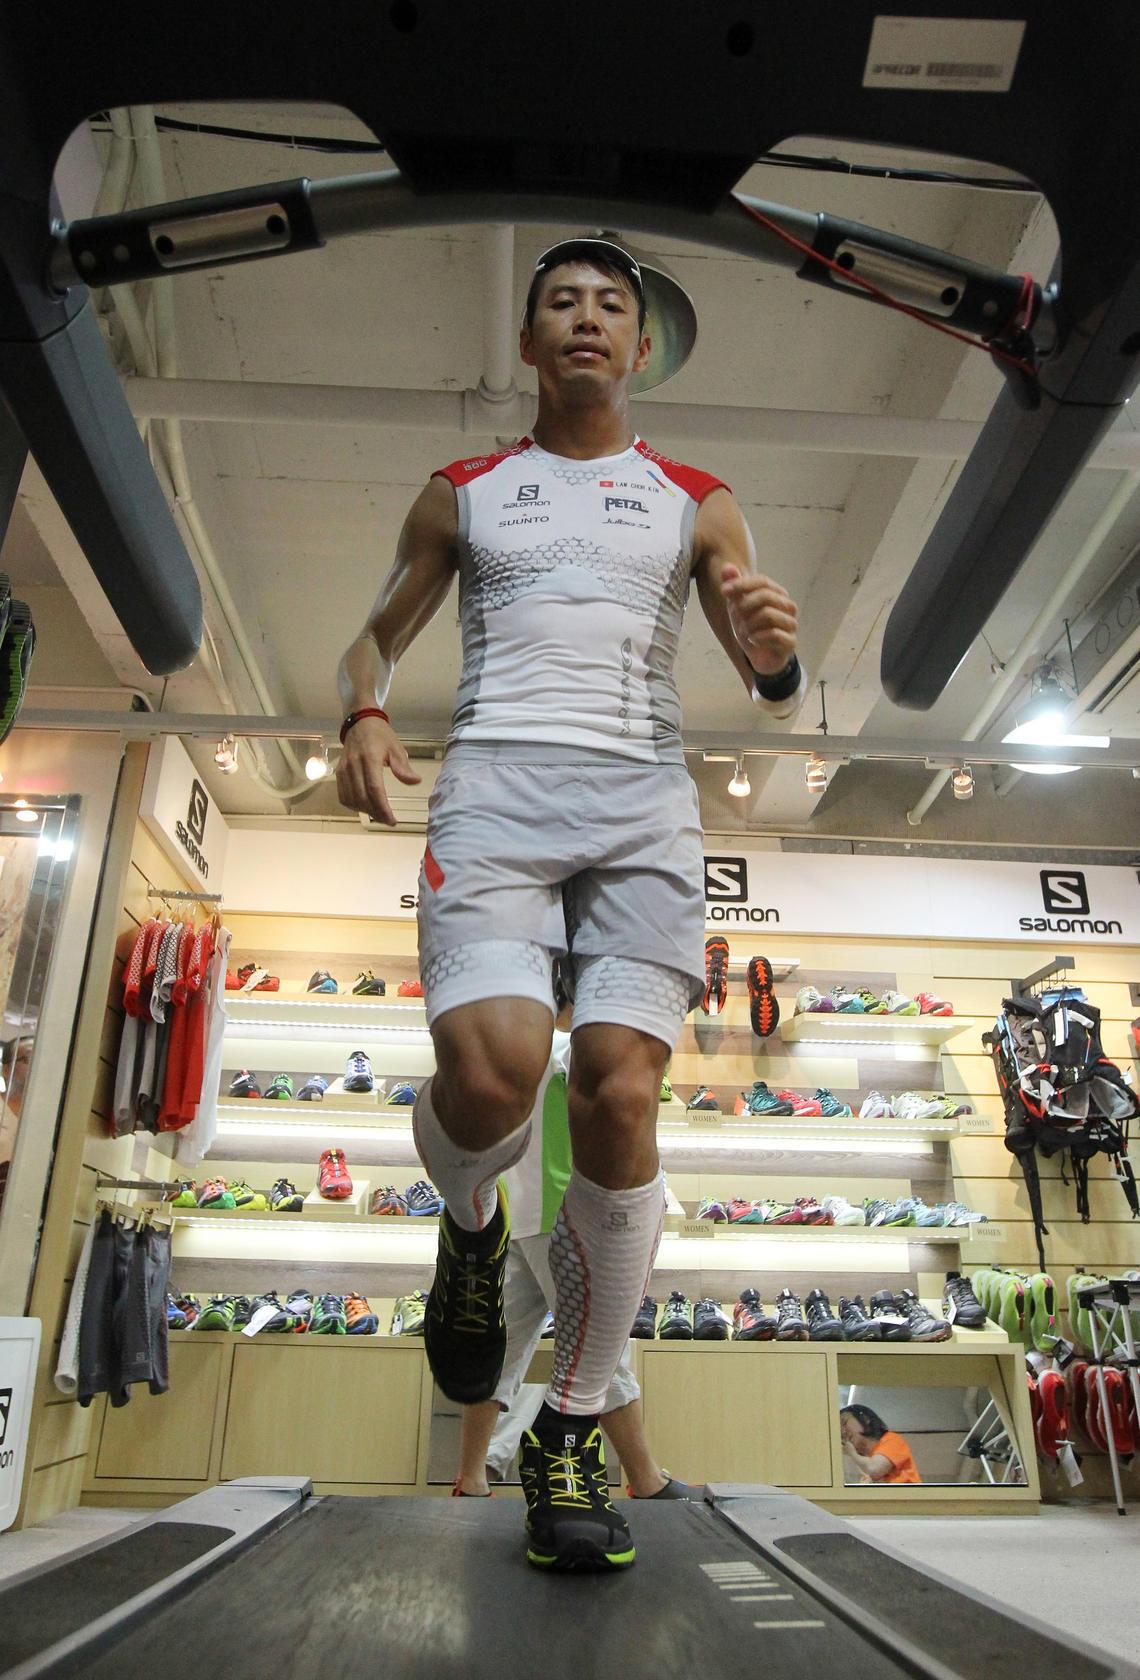 Ultramarathon News Podcasts: Hongkonger Law Chor-kin Prepares To Tackle Death Valley's